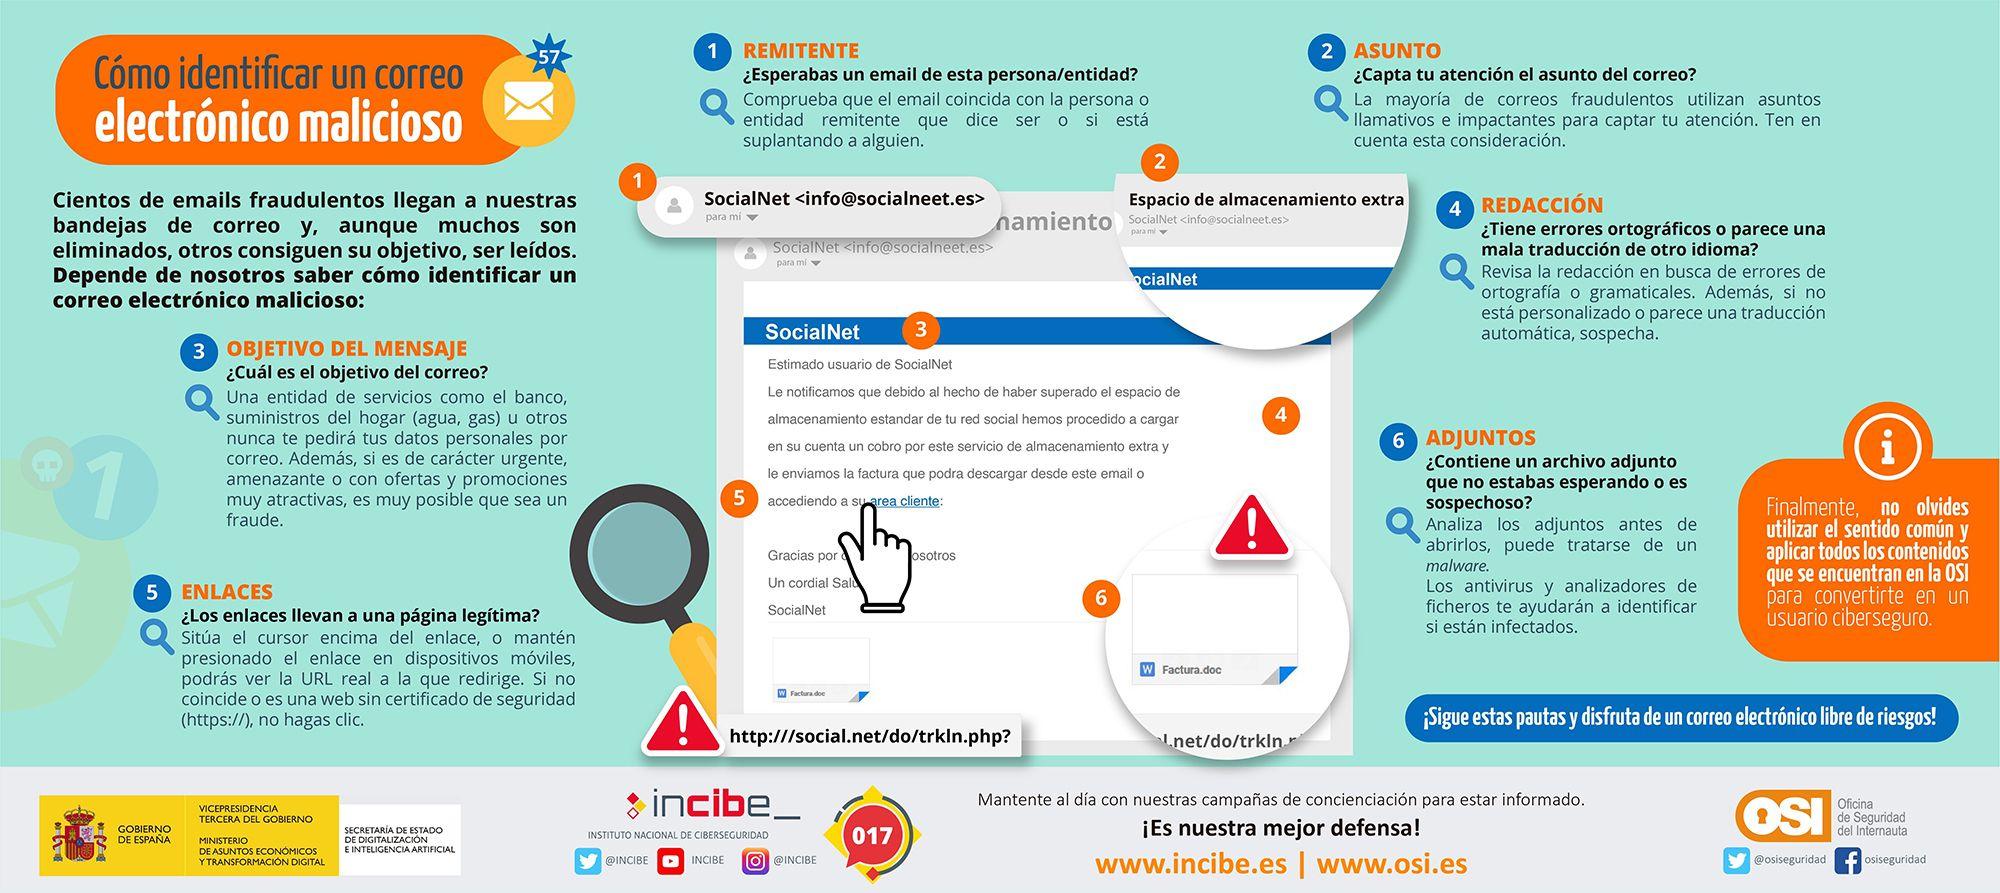 Cómo identificar un correo electronico falso